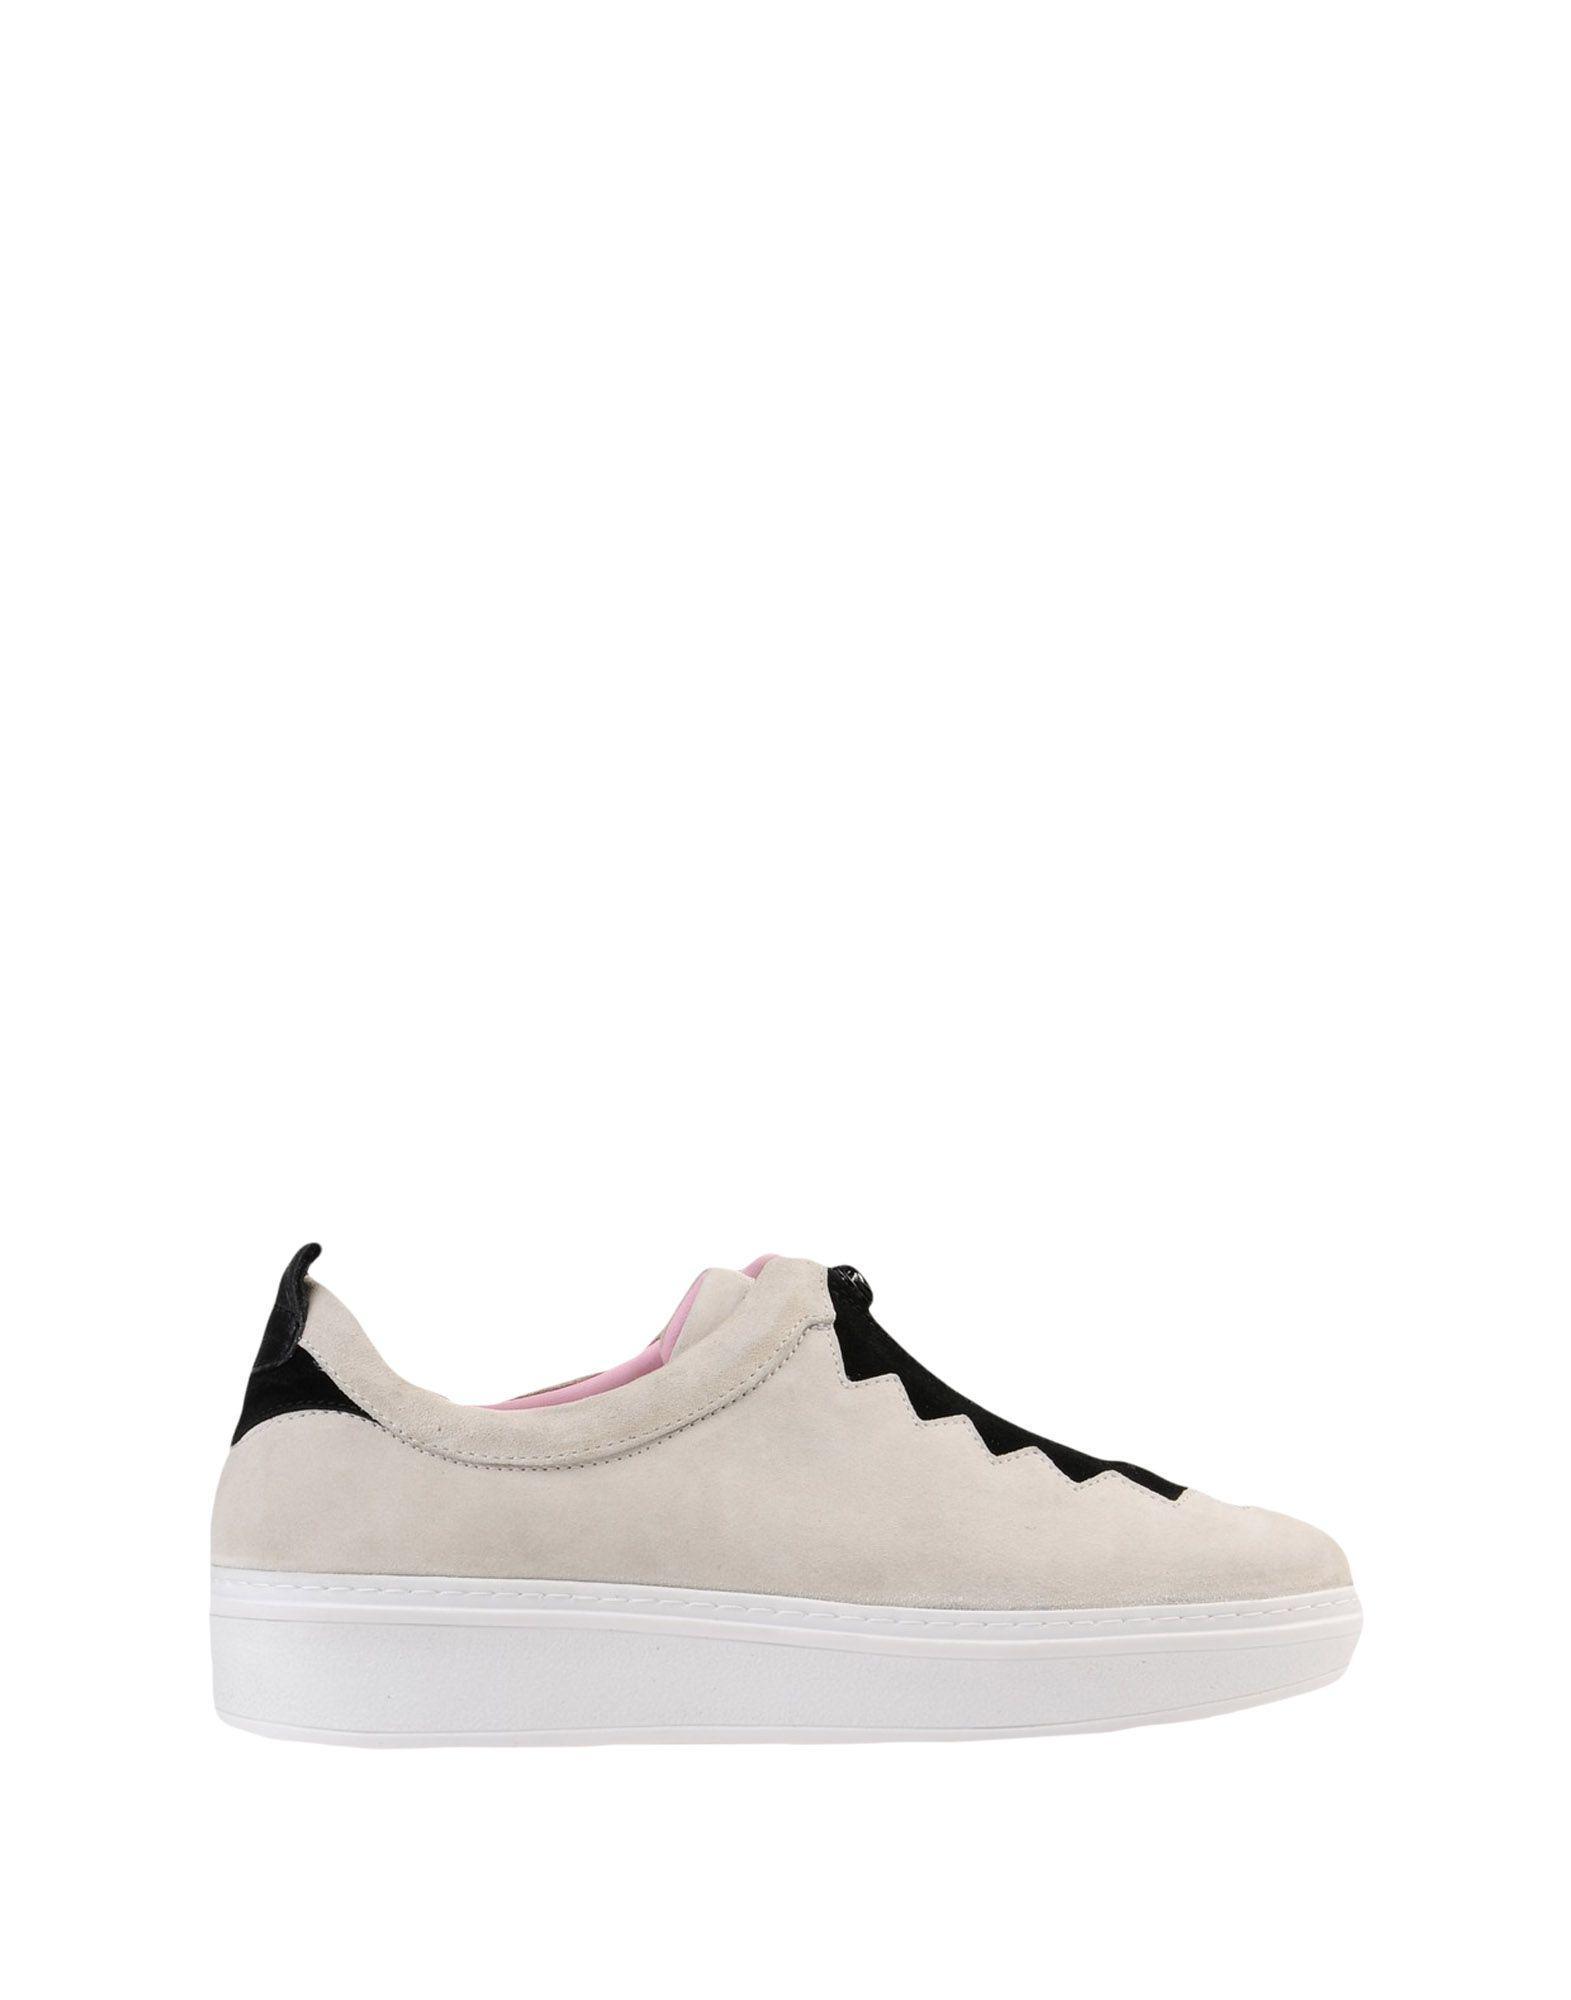 reputable site 5b83c c7f0b maison-shoeshibar-Ivory-Low-tops-Sneakers.jpeg